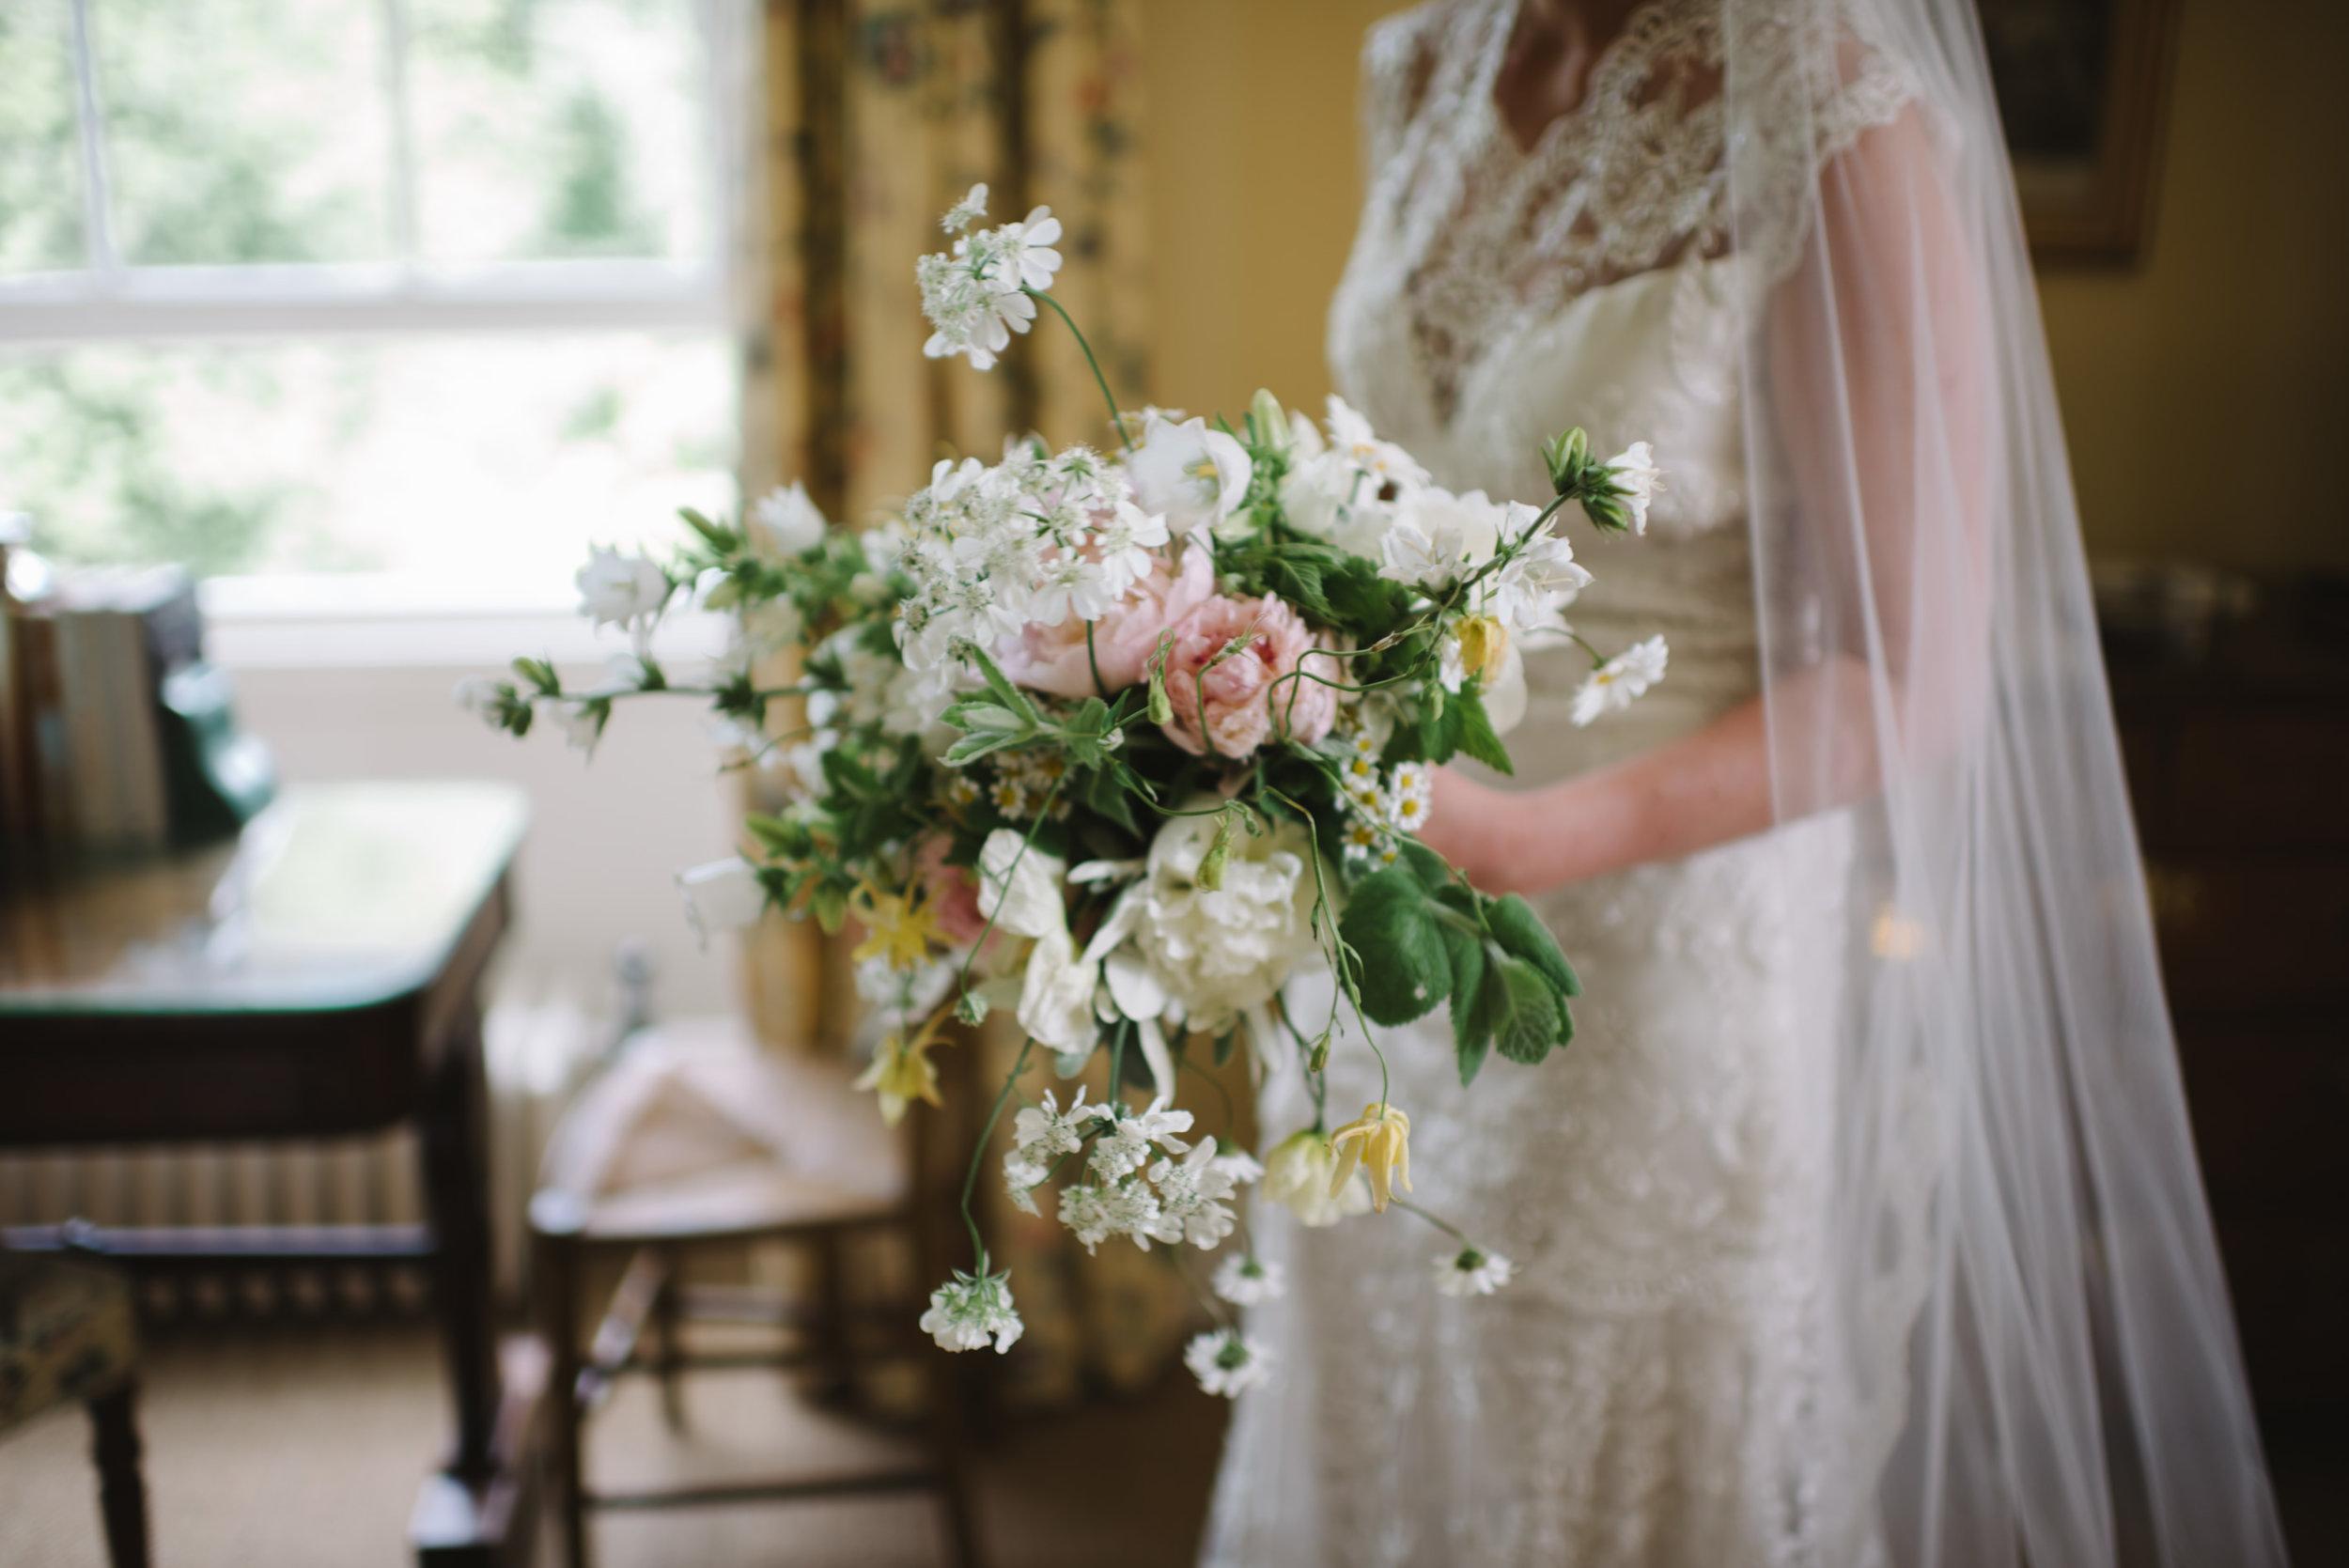 0017-LISA-DEVINE-PHOTOGRAPHY-ALTERNATIVE-WEDDING-PHOTOGRAPHY-SCOTLAND-DESTINATION-WEDDINGS-GLASGOW-WEDDINGS-COOL-WEDDINGS-STYLISH-WEDDINGS.JPG